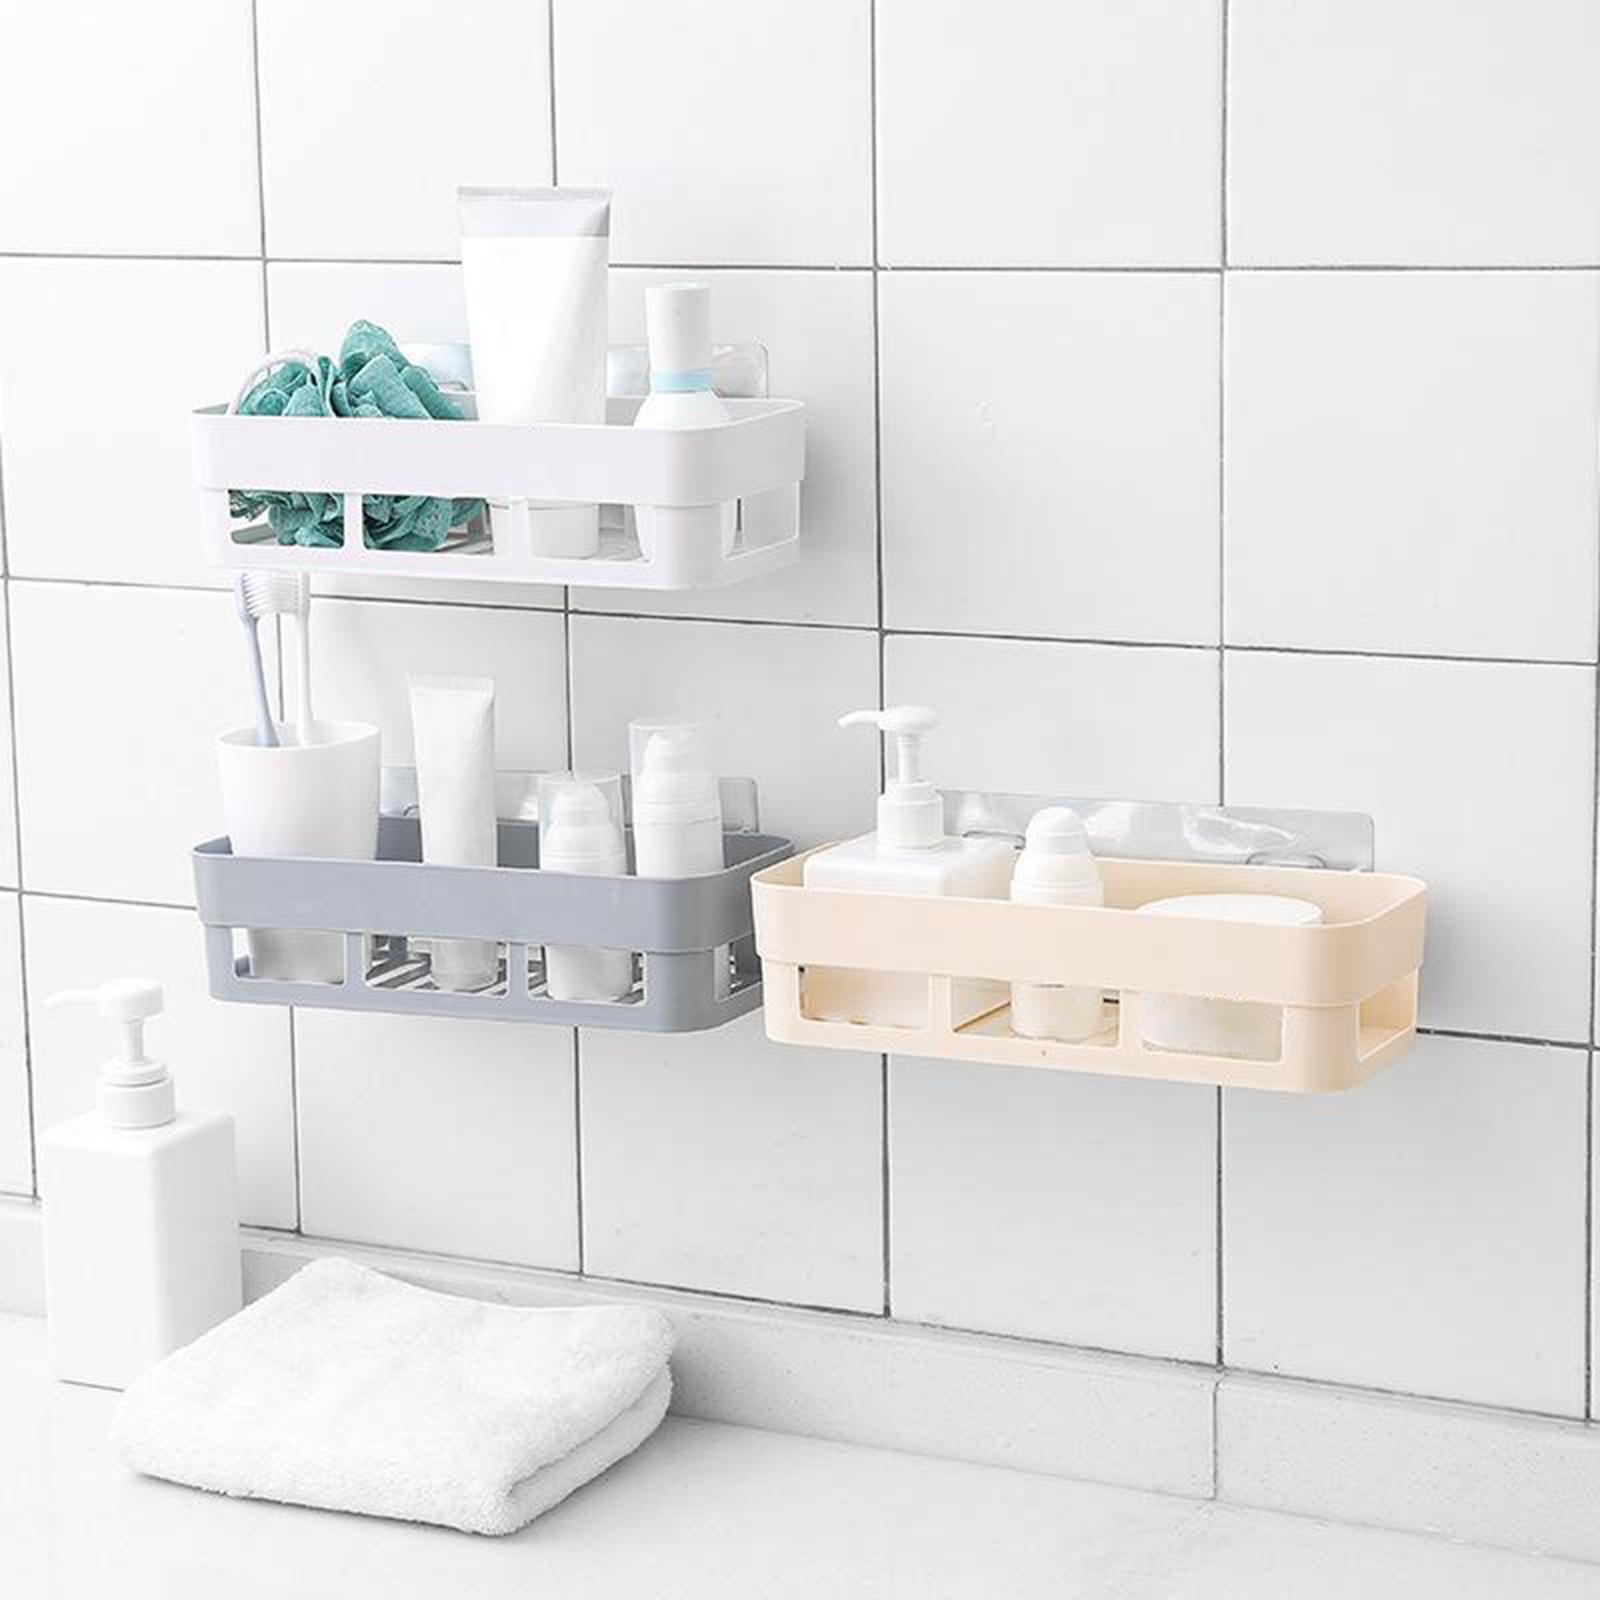 thumbnail 11 - Self-Adhesive-Shower-Shelf-Plastic-Shower-Caddy-Organiser-Bathroom-Shelf